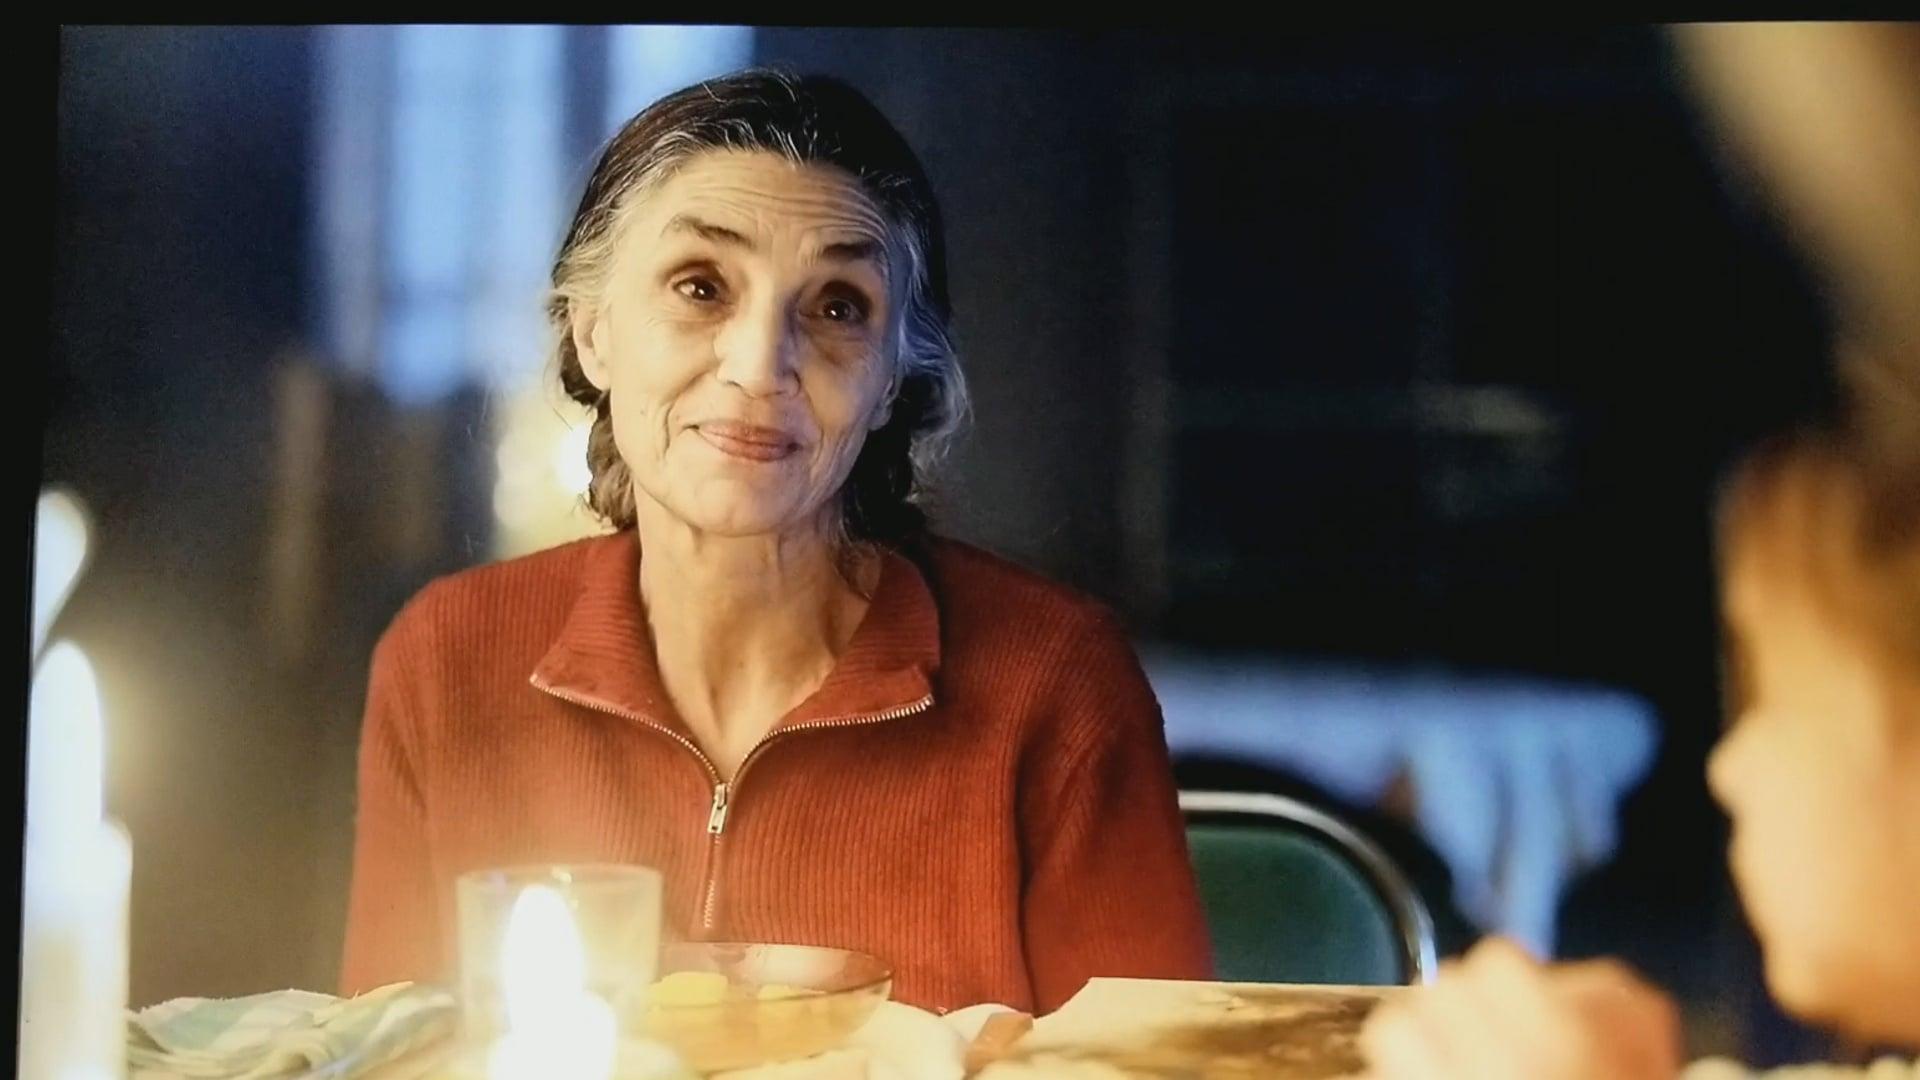 Susana Ballesteros English Dubbing for Netflix